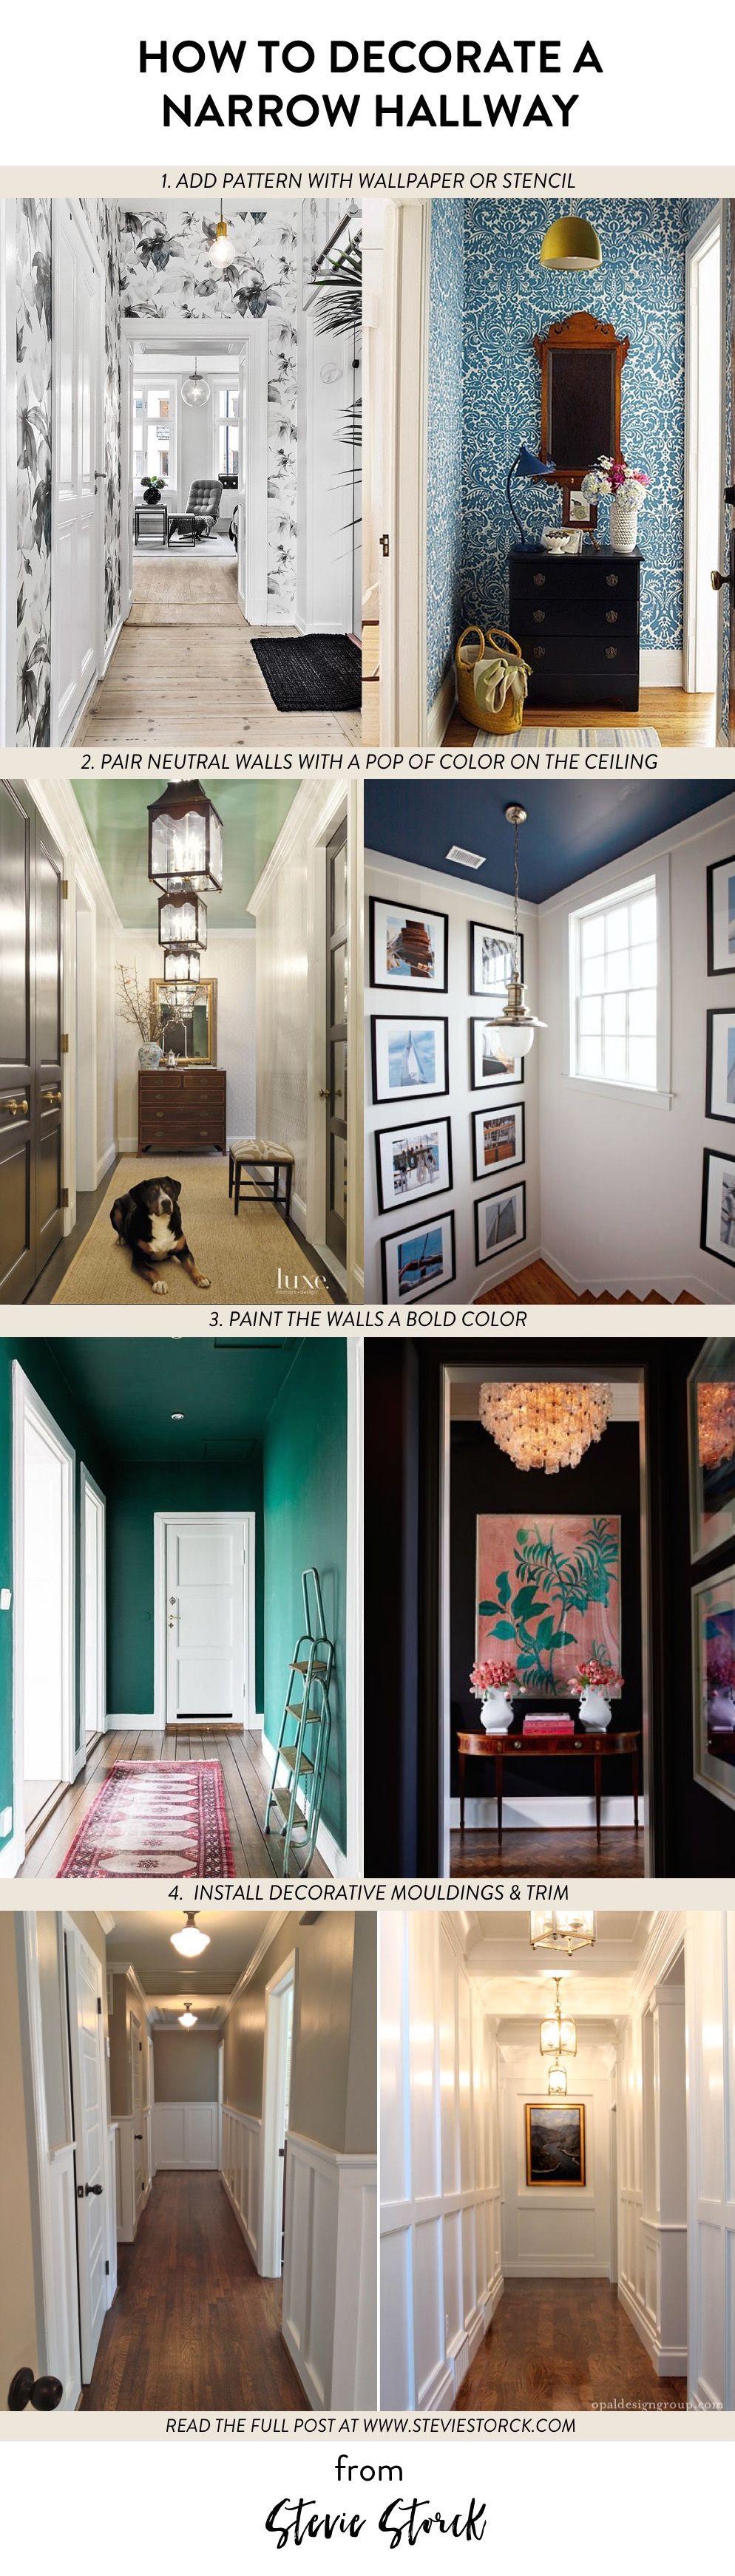 Narrow hallway decor  Decorating a Narrow Hallway  Decorative mouldings Neutral walls